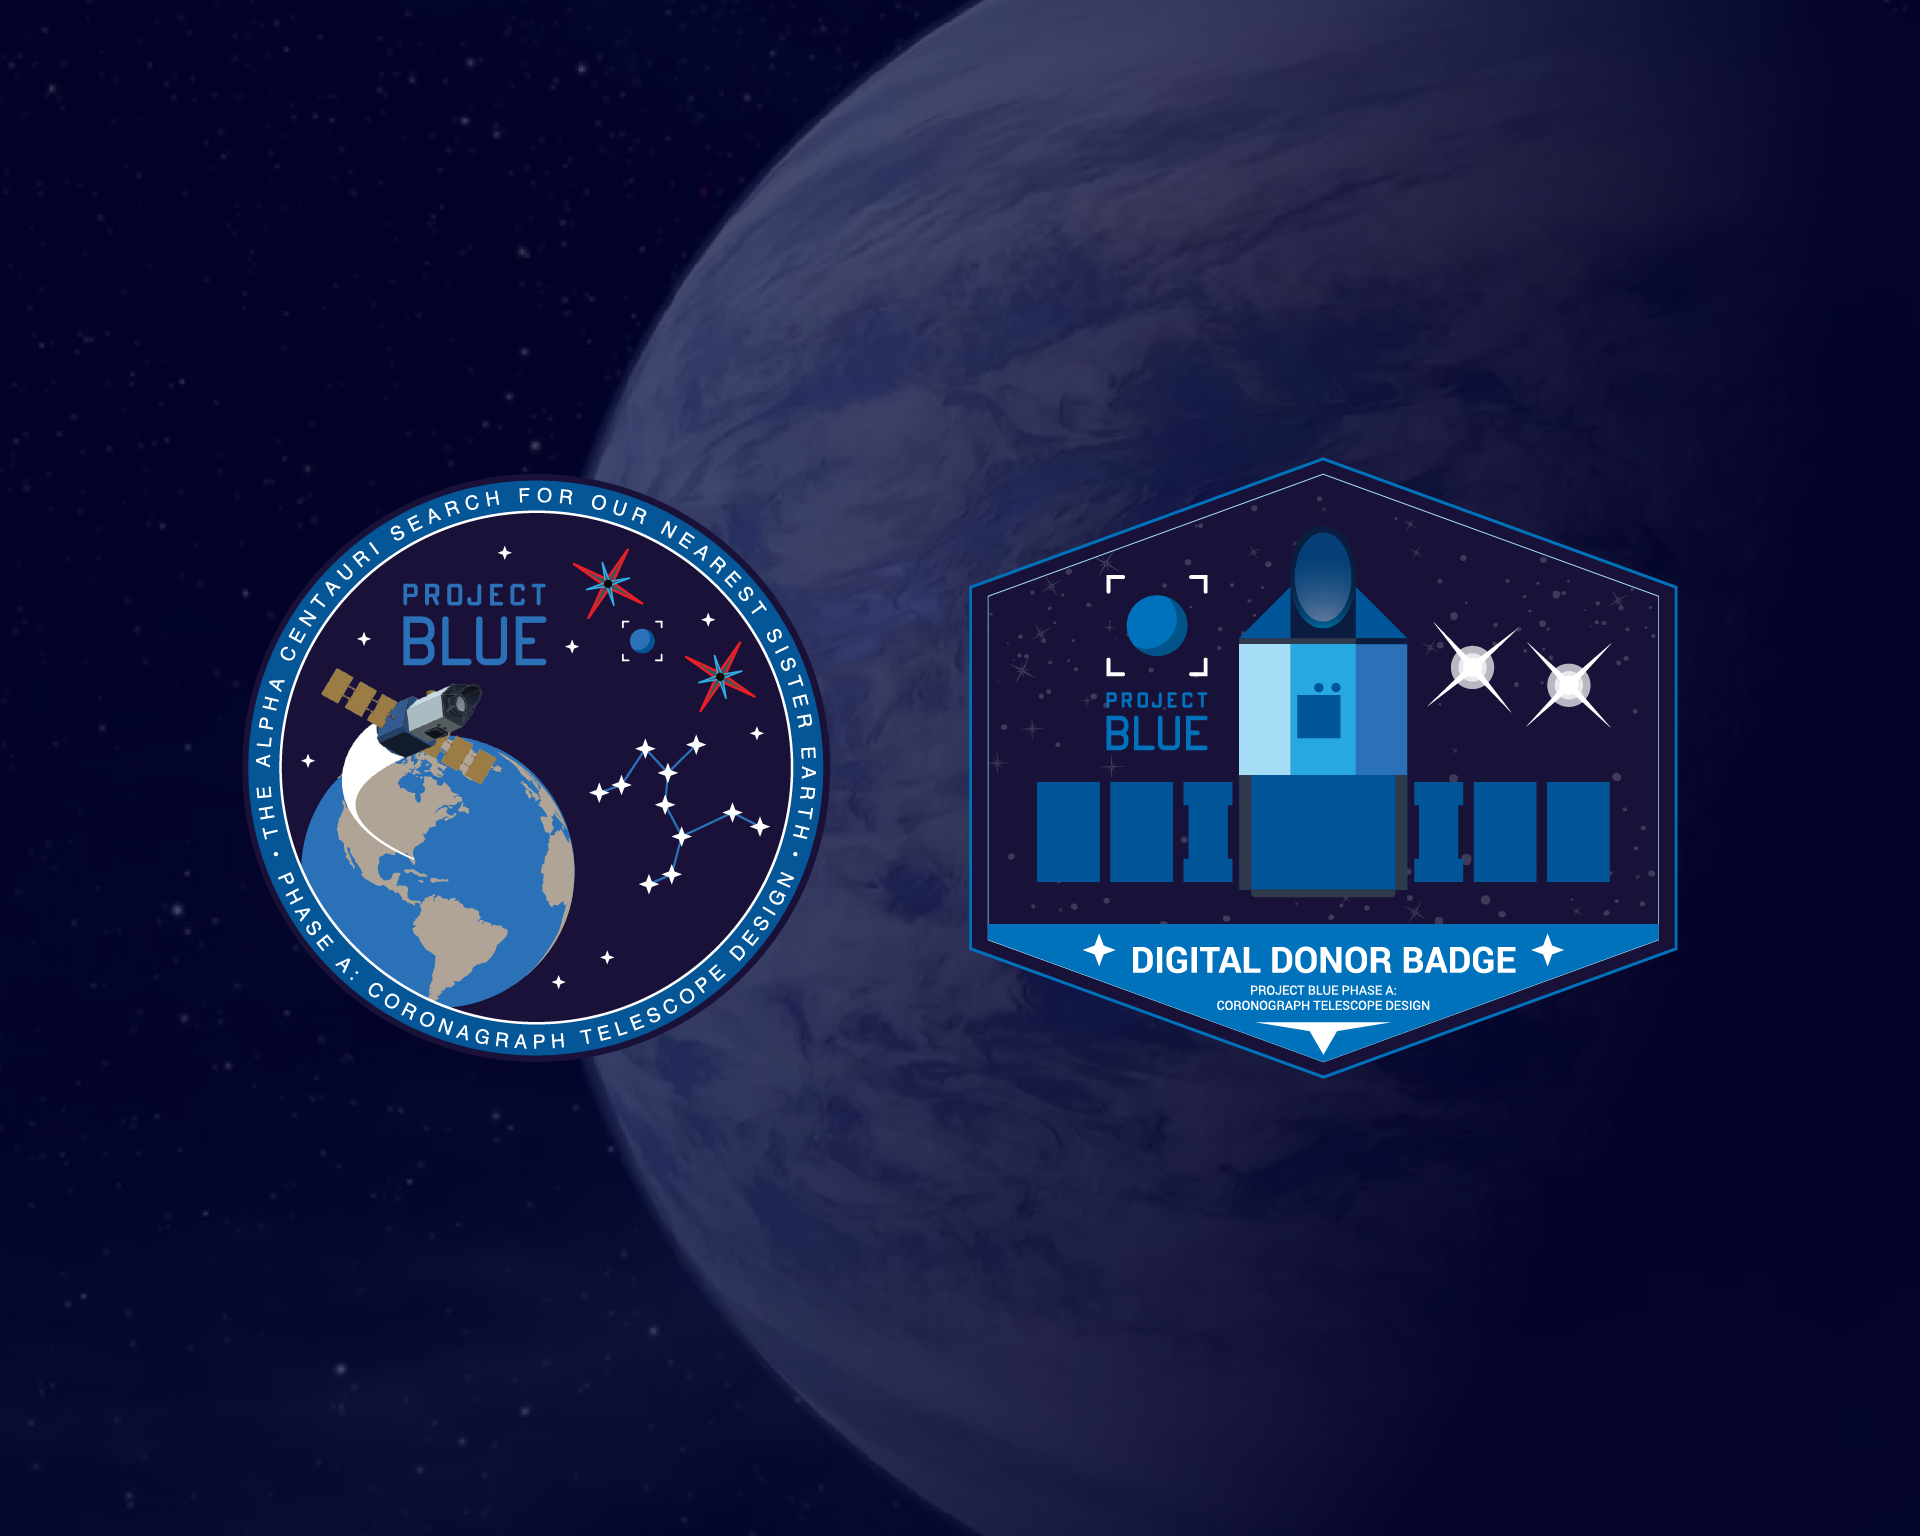 Project Blue Digital Donor Fullscreen Wallpaper